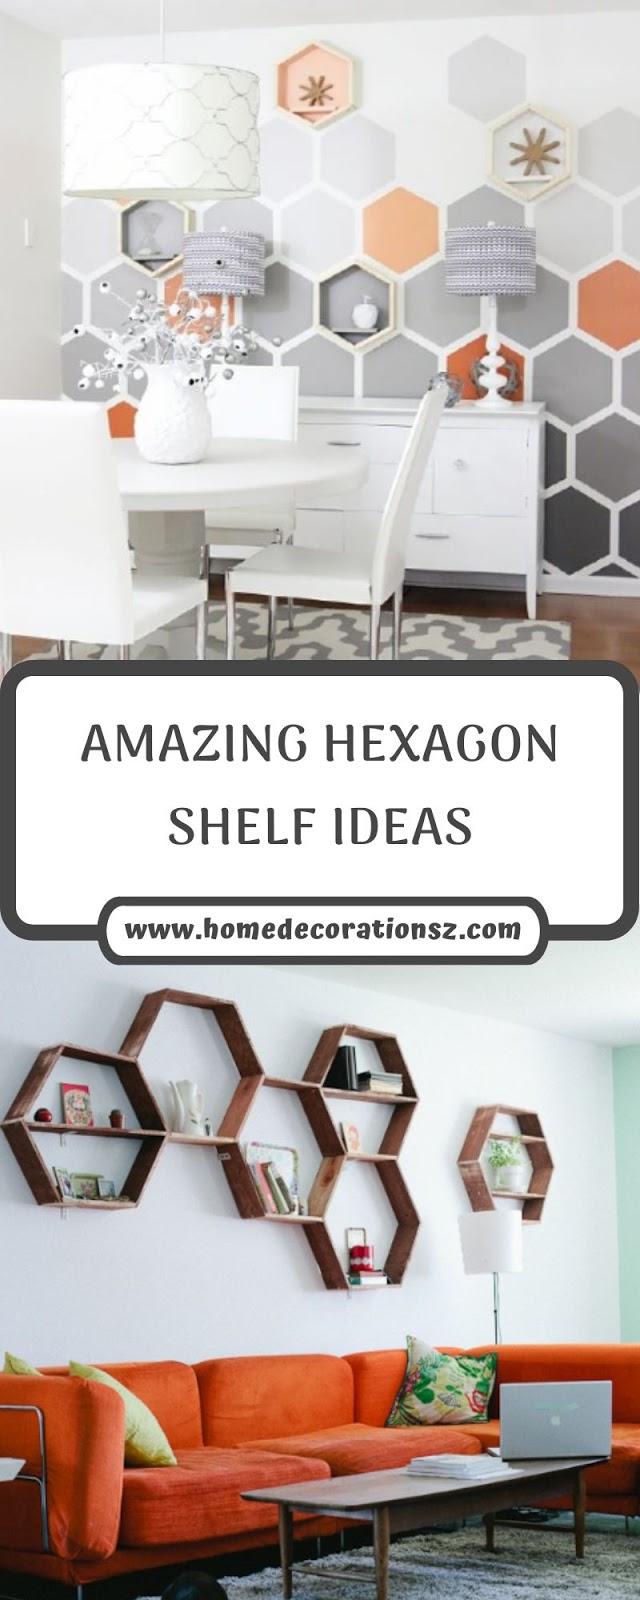 AMAZING HEXAGON SHELF IDEAS